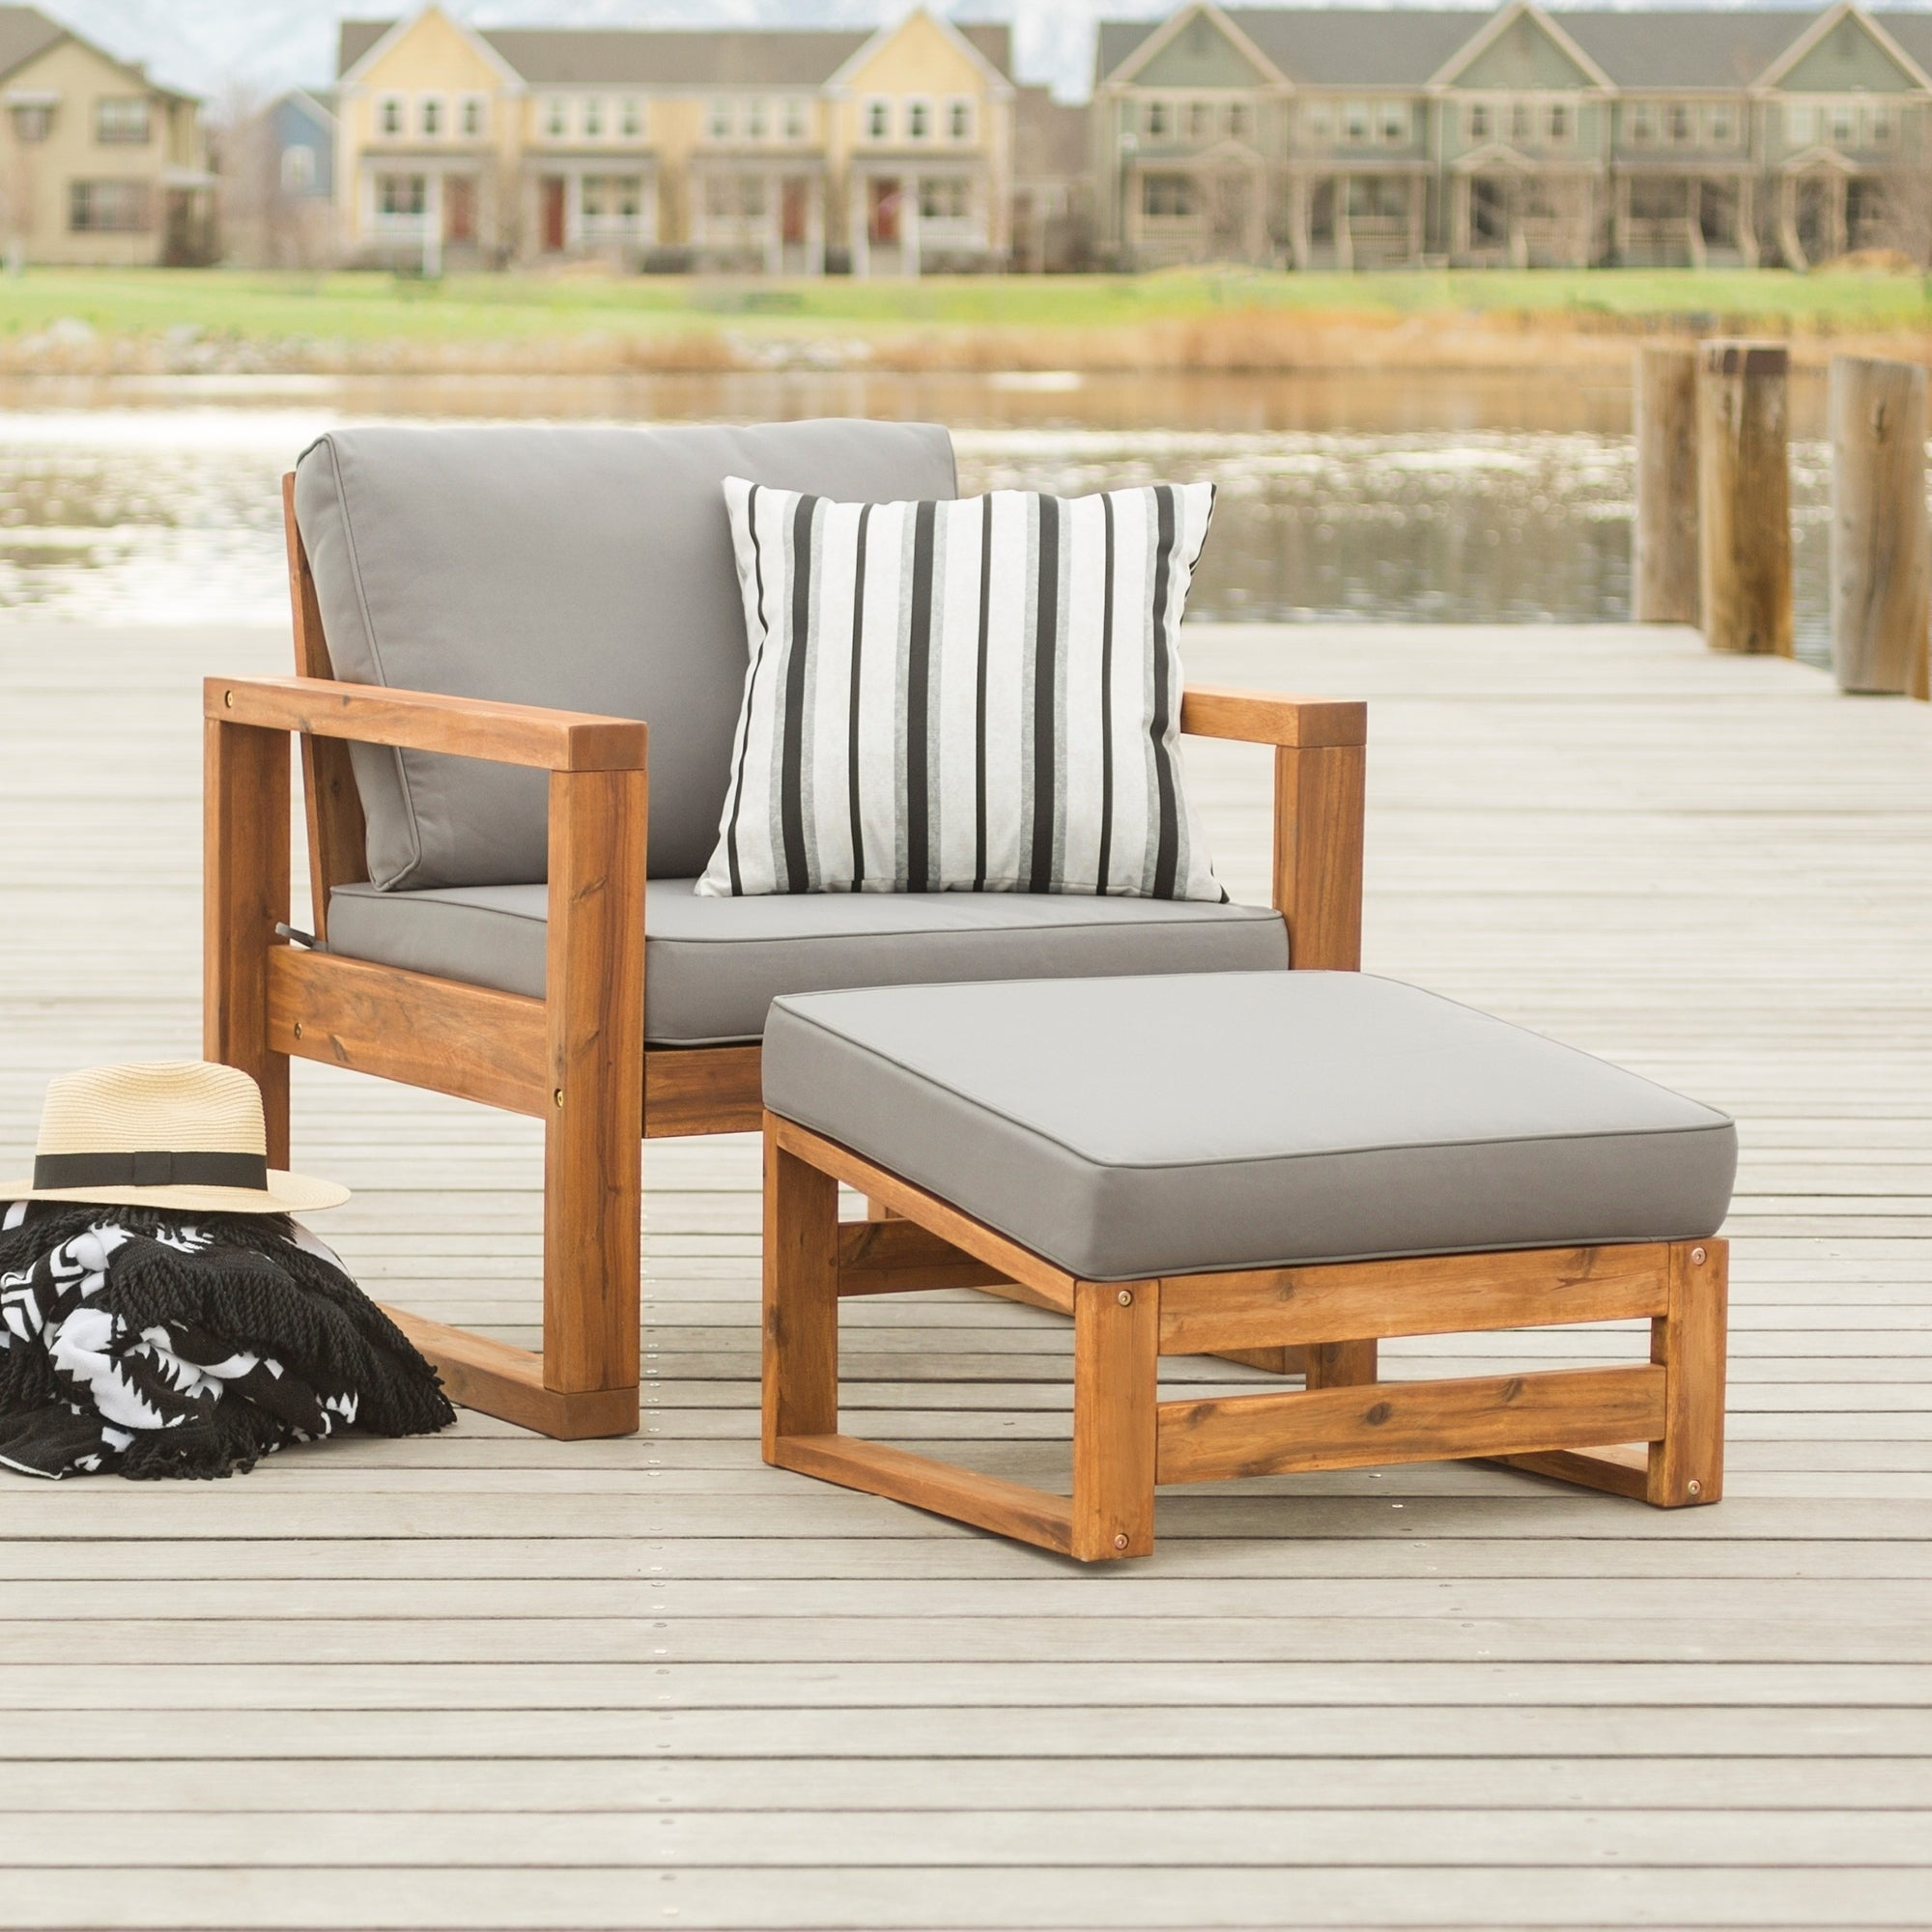 Superieur Hudson Acacia Outdoor Chair And Ottoman Set